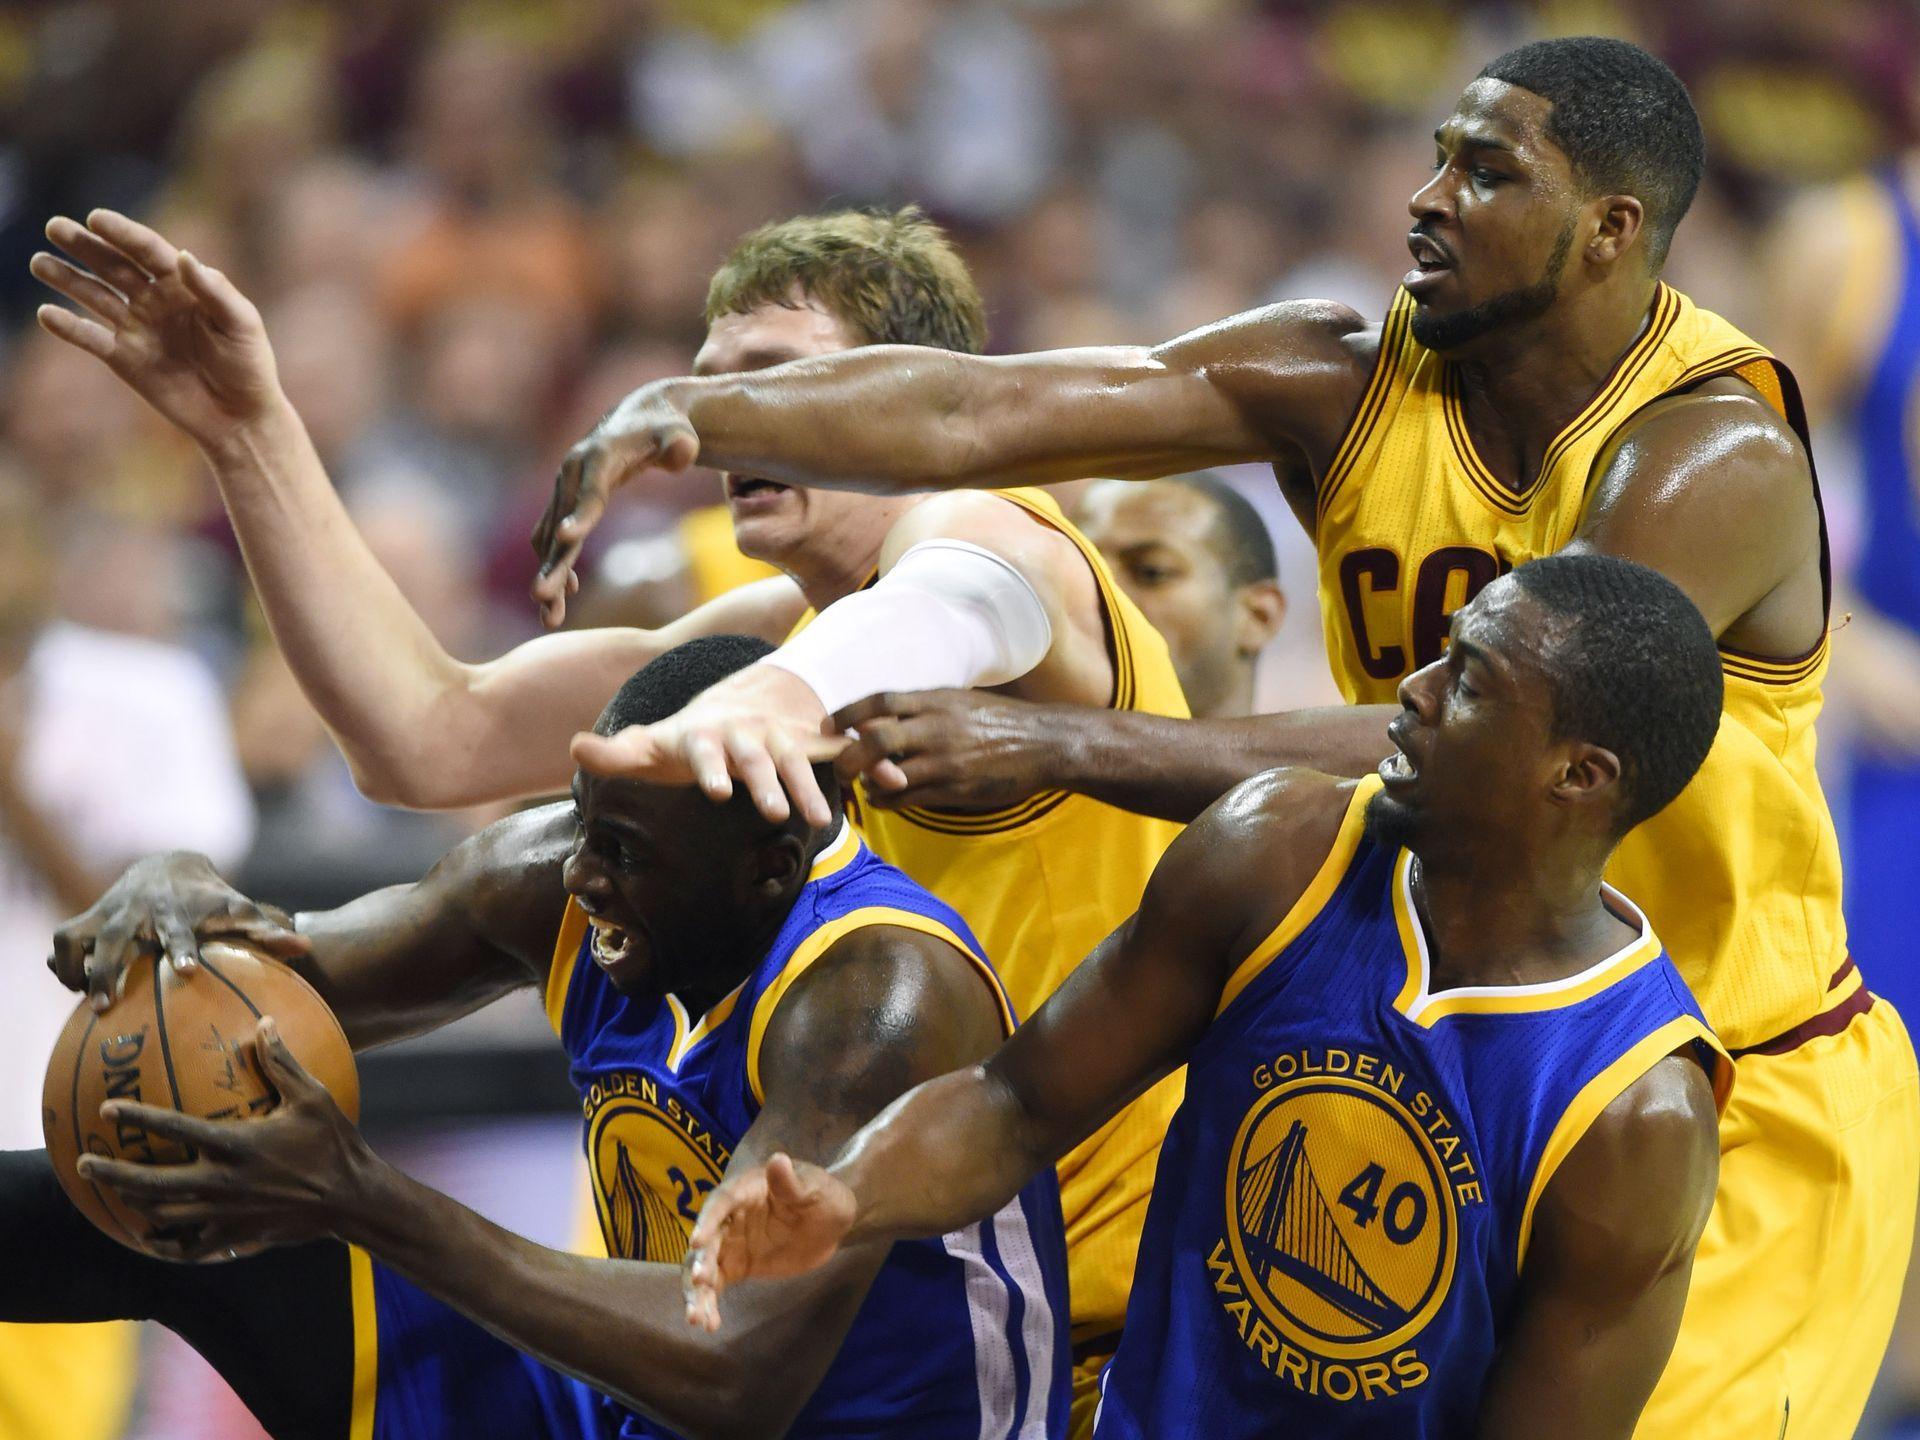 Warriors were best team all season, winning NBA title is